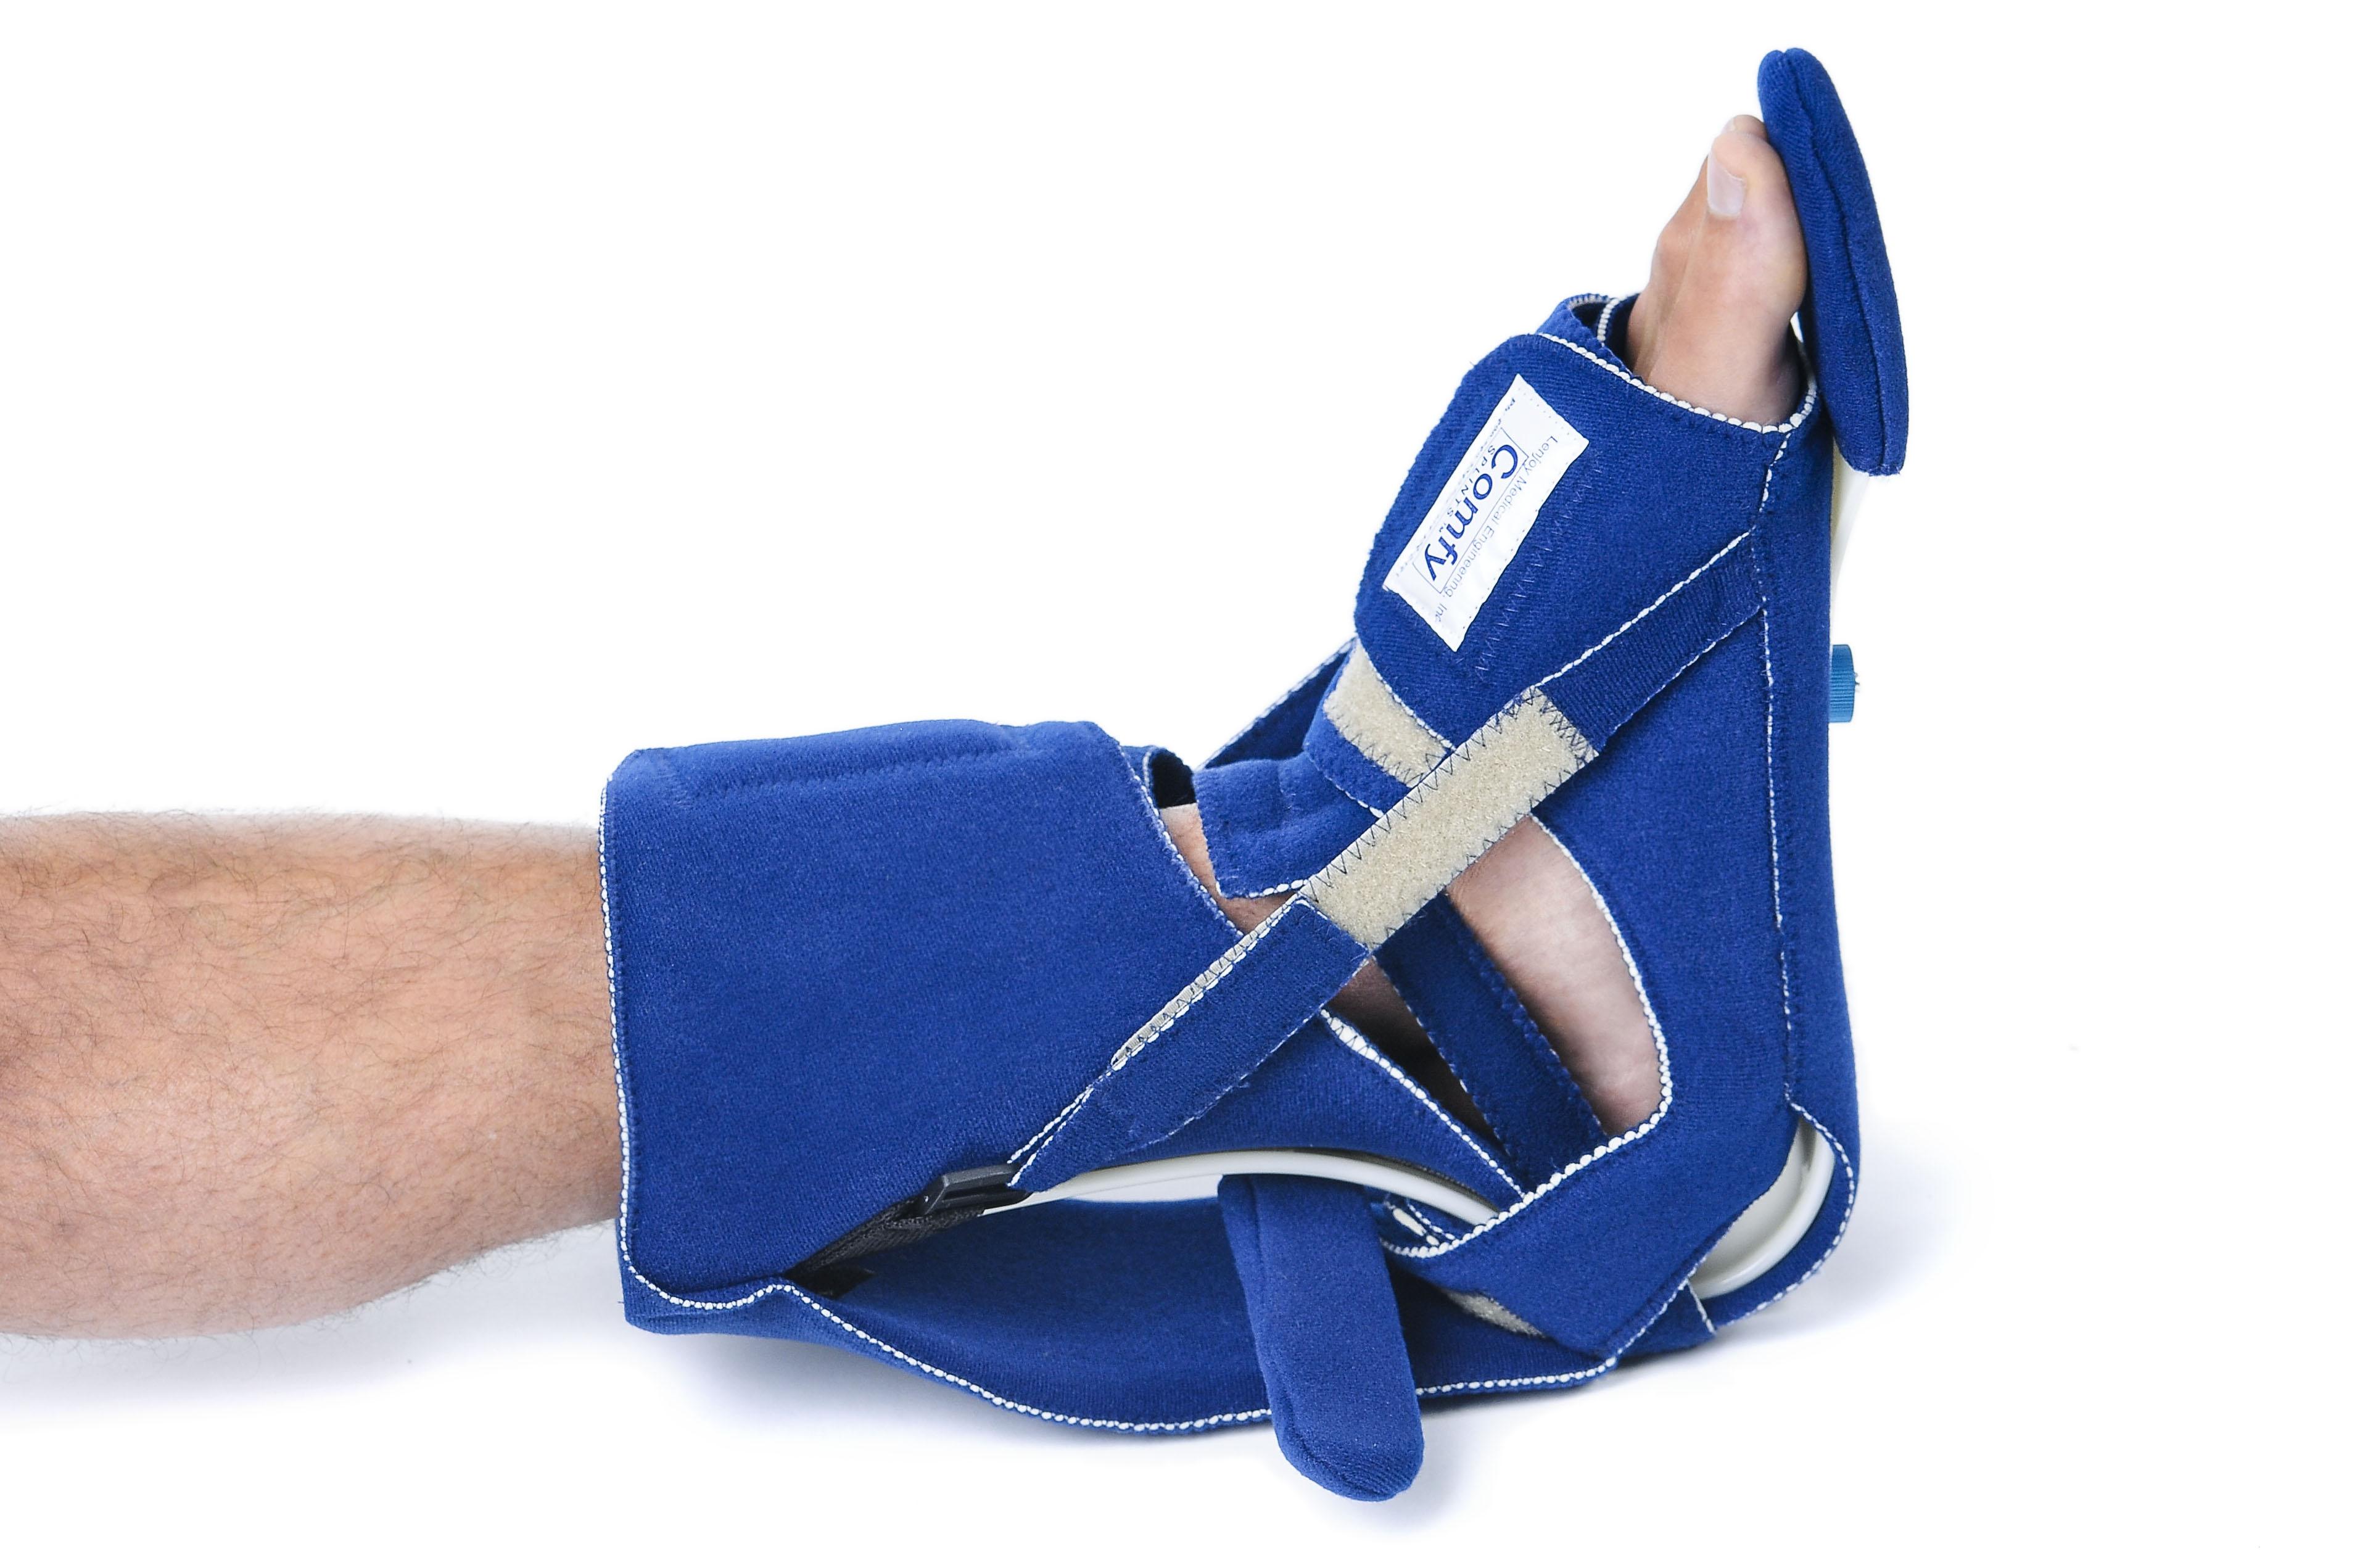 Ankle Foot Tightness Clinical Concerns Neurorehabdirectory Com